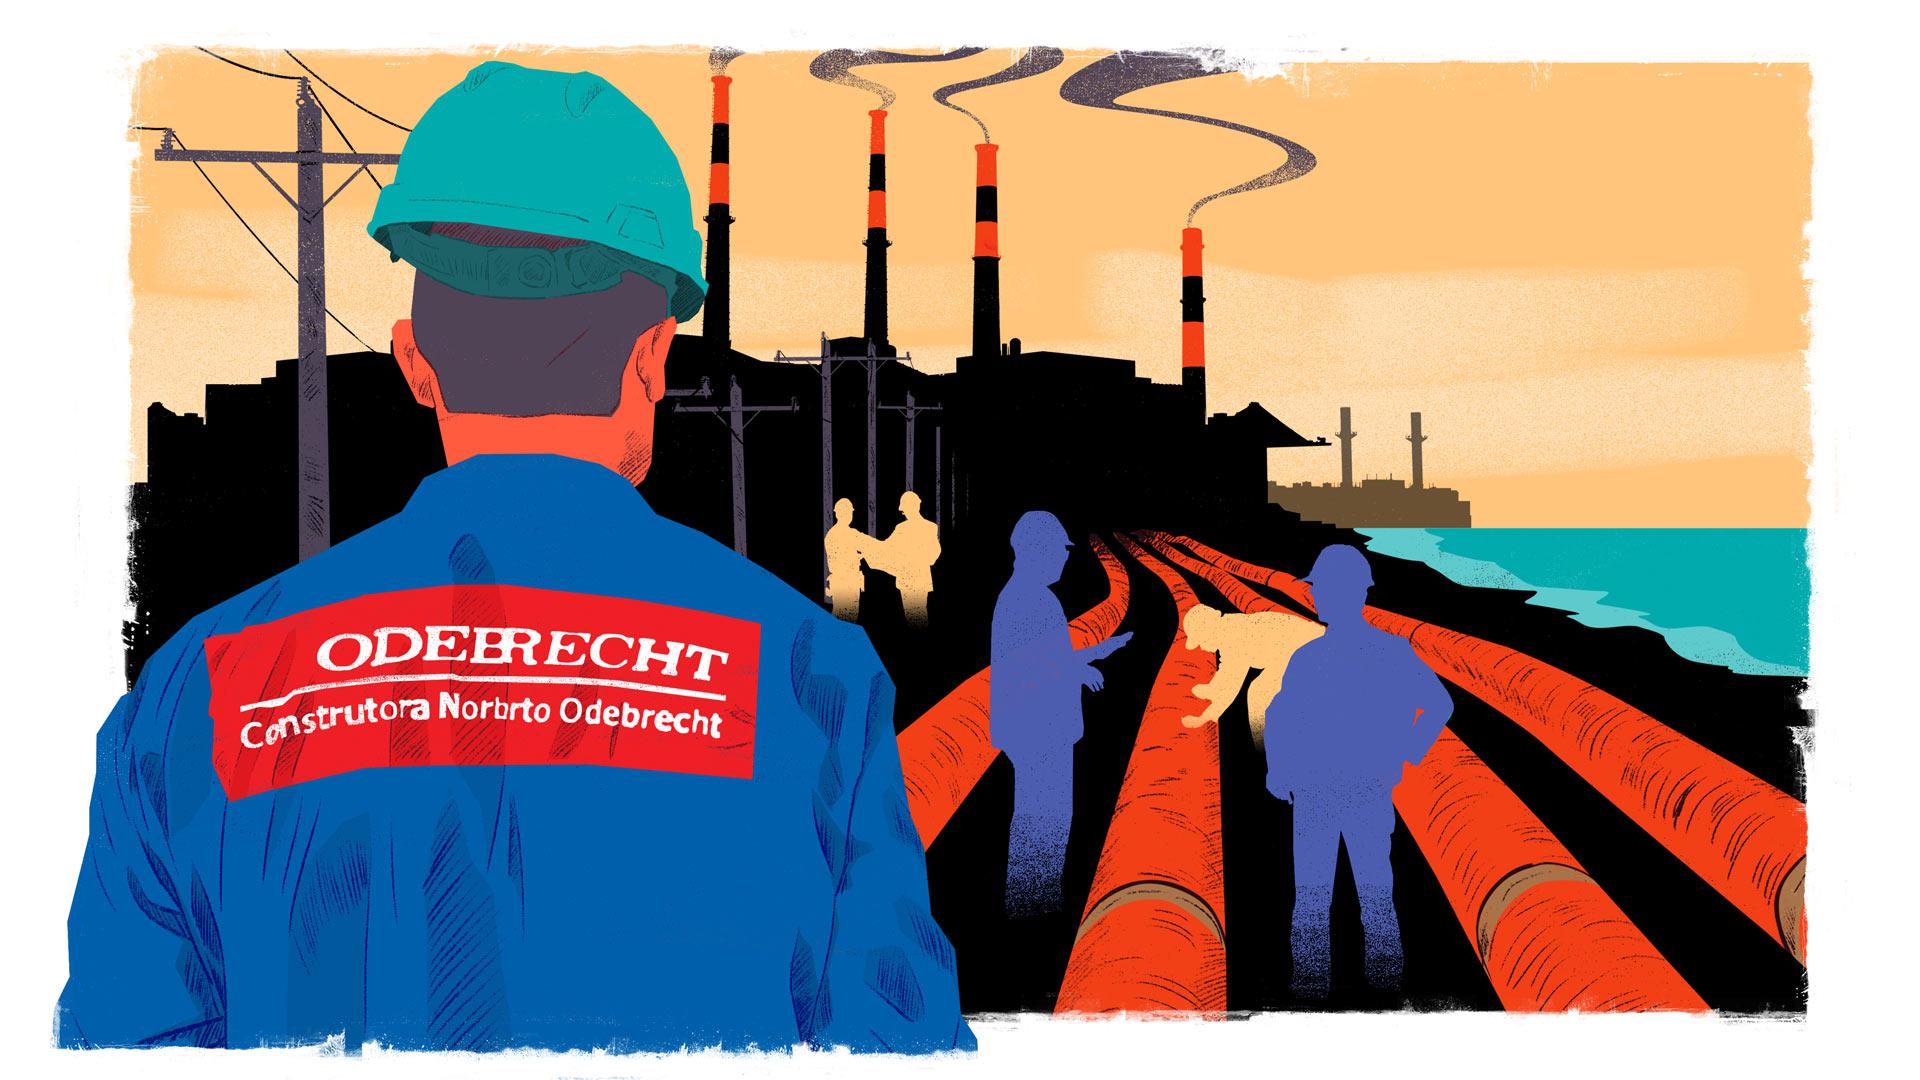 Odebrecht Construction Bribery Division